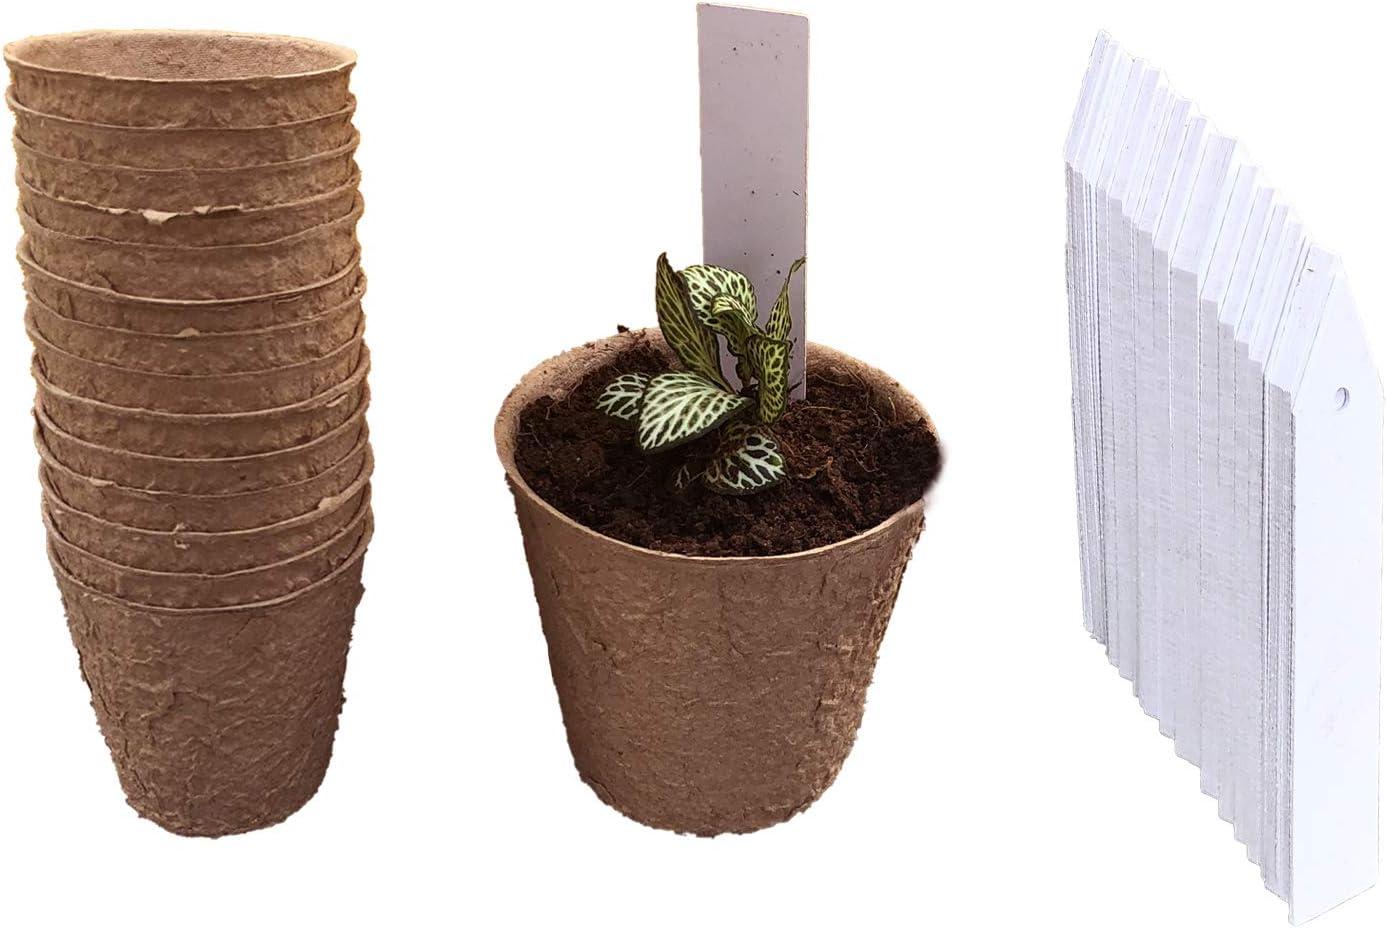 "WILD-WIND 90 4 years warranty Packs 3"" Seed Ranking TOP19 Starter Seedling Pots P pods"